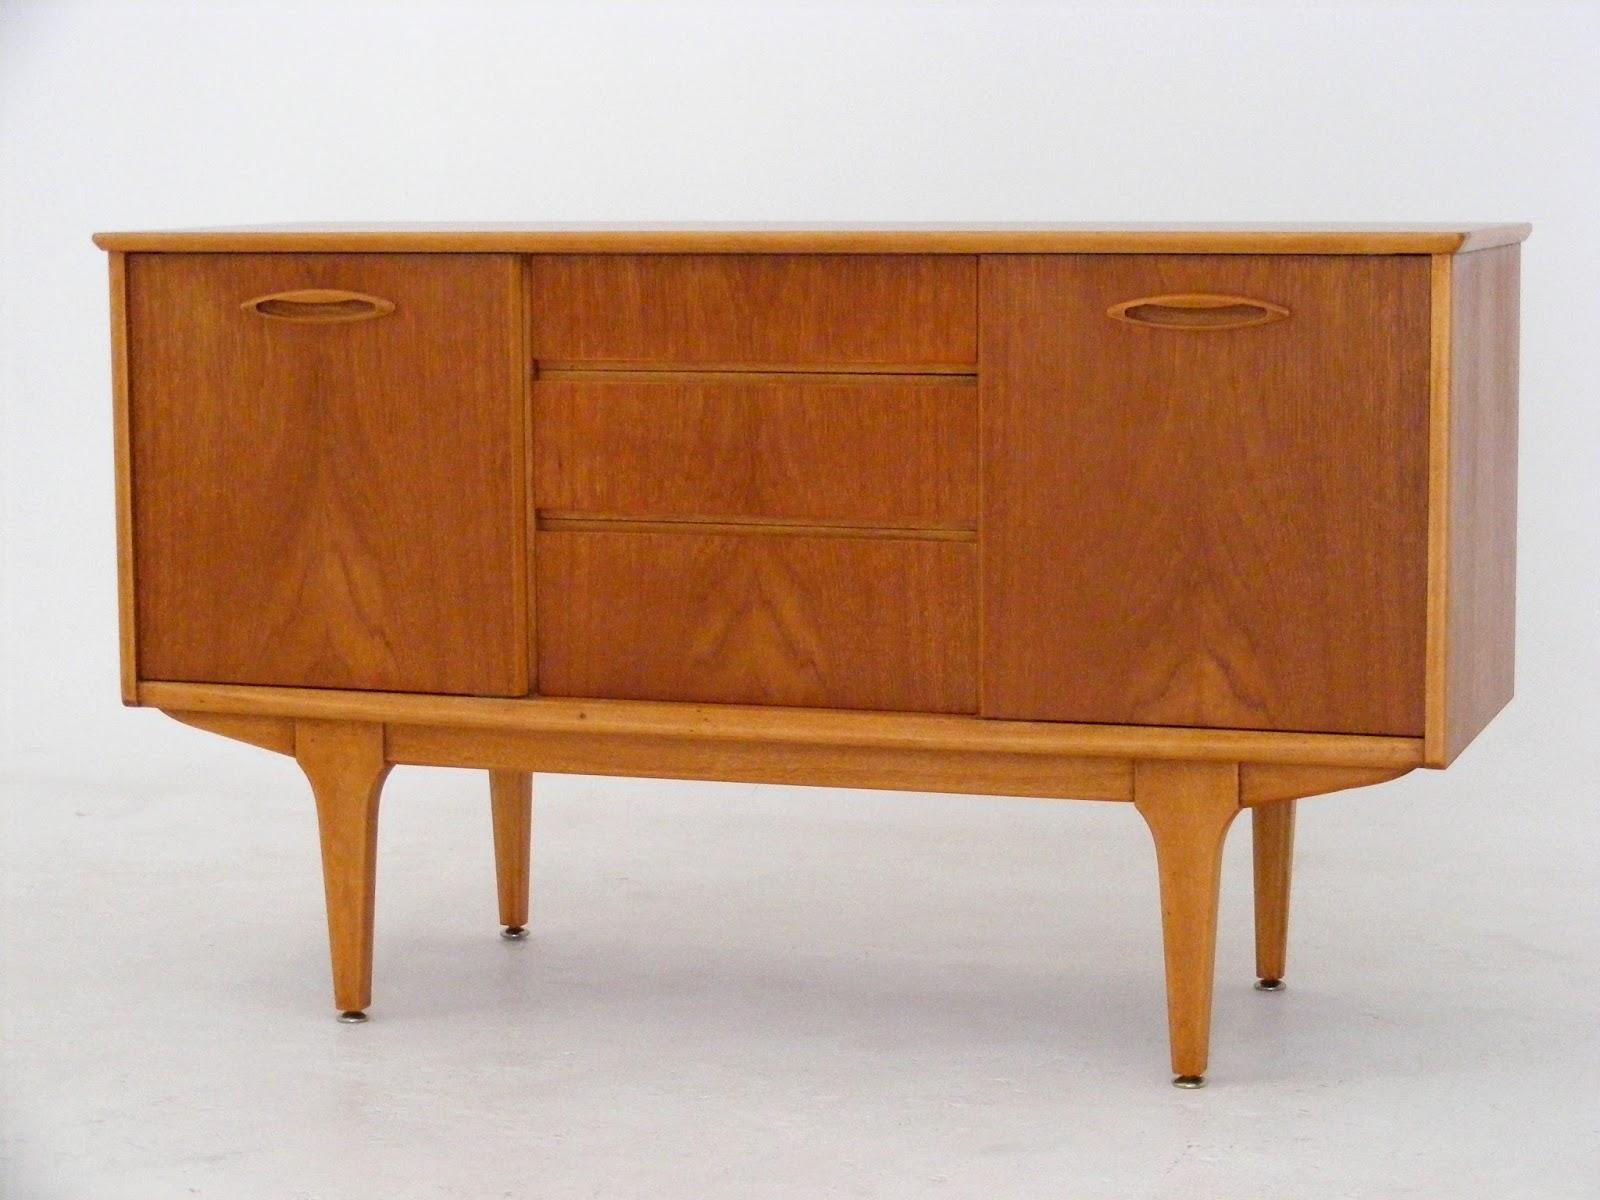 VAMP FURNITURE This weeks new vintage furniture stock at  : PIC2B1BVAMPJENTIQUE2BSIDEBOARD03062016 from vampfurniture.blogspot.com size 1600 x 1200 jpeg 237kB